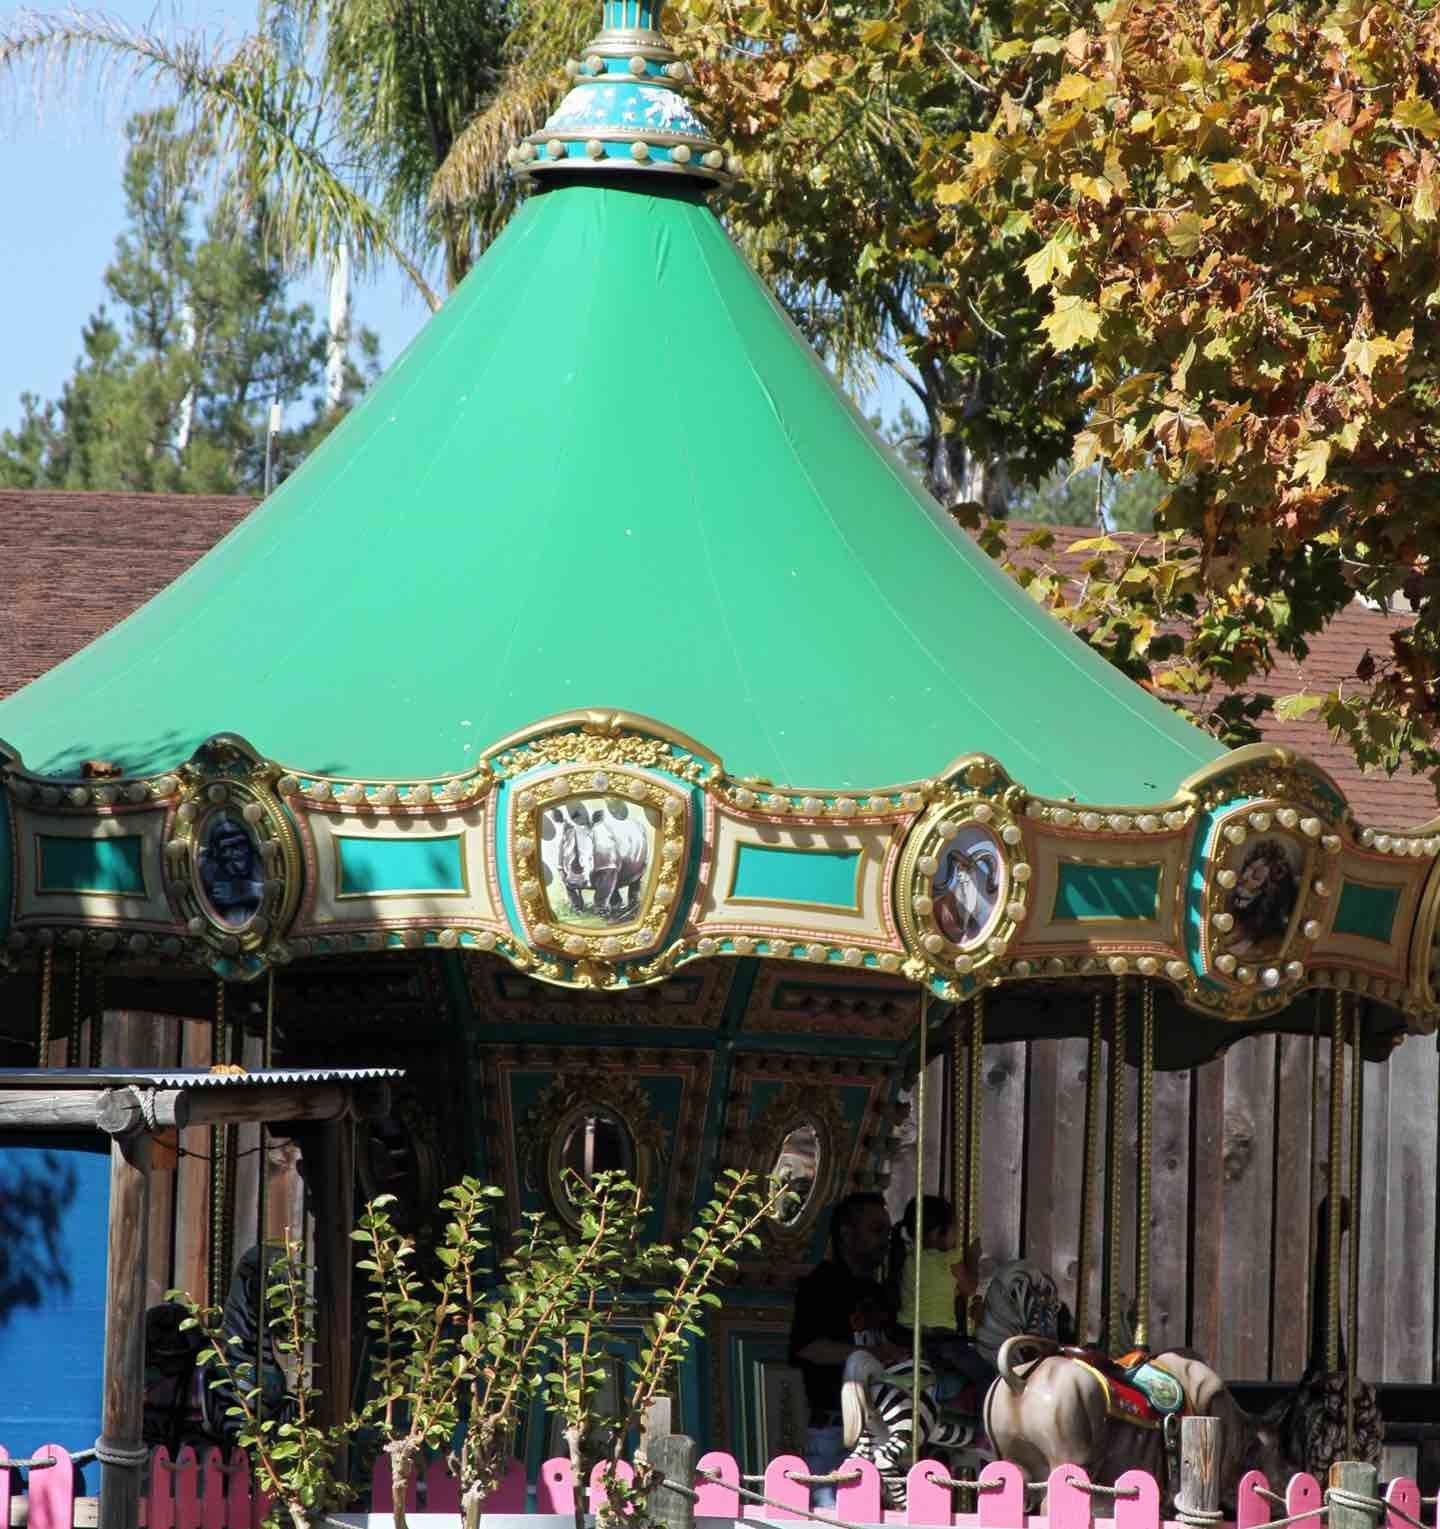 A small green carousel.